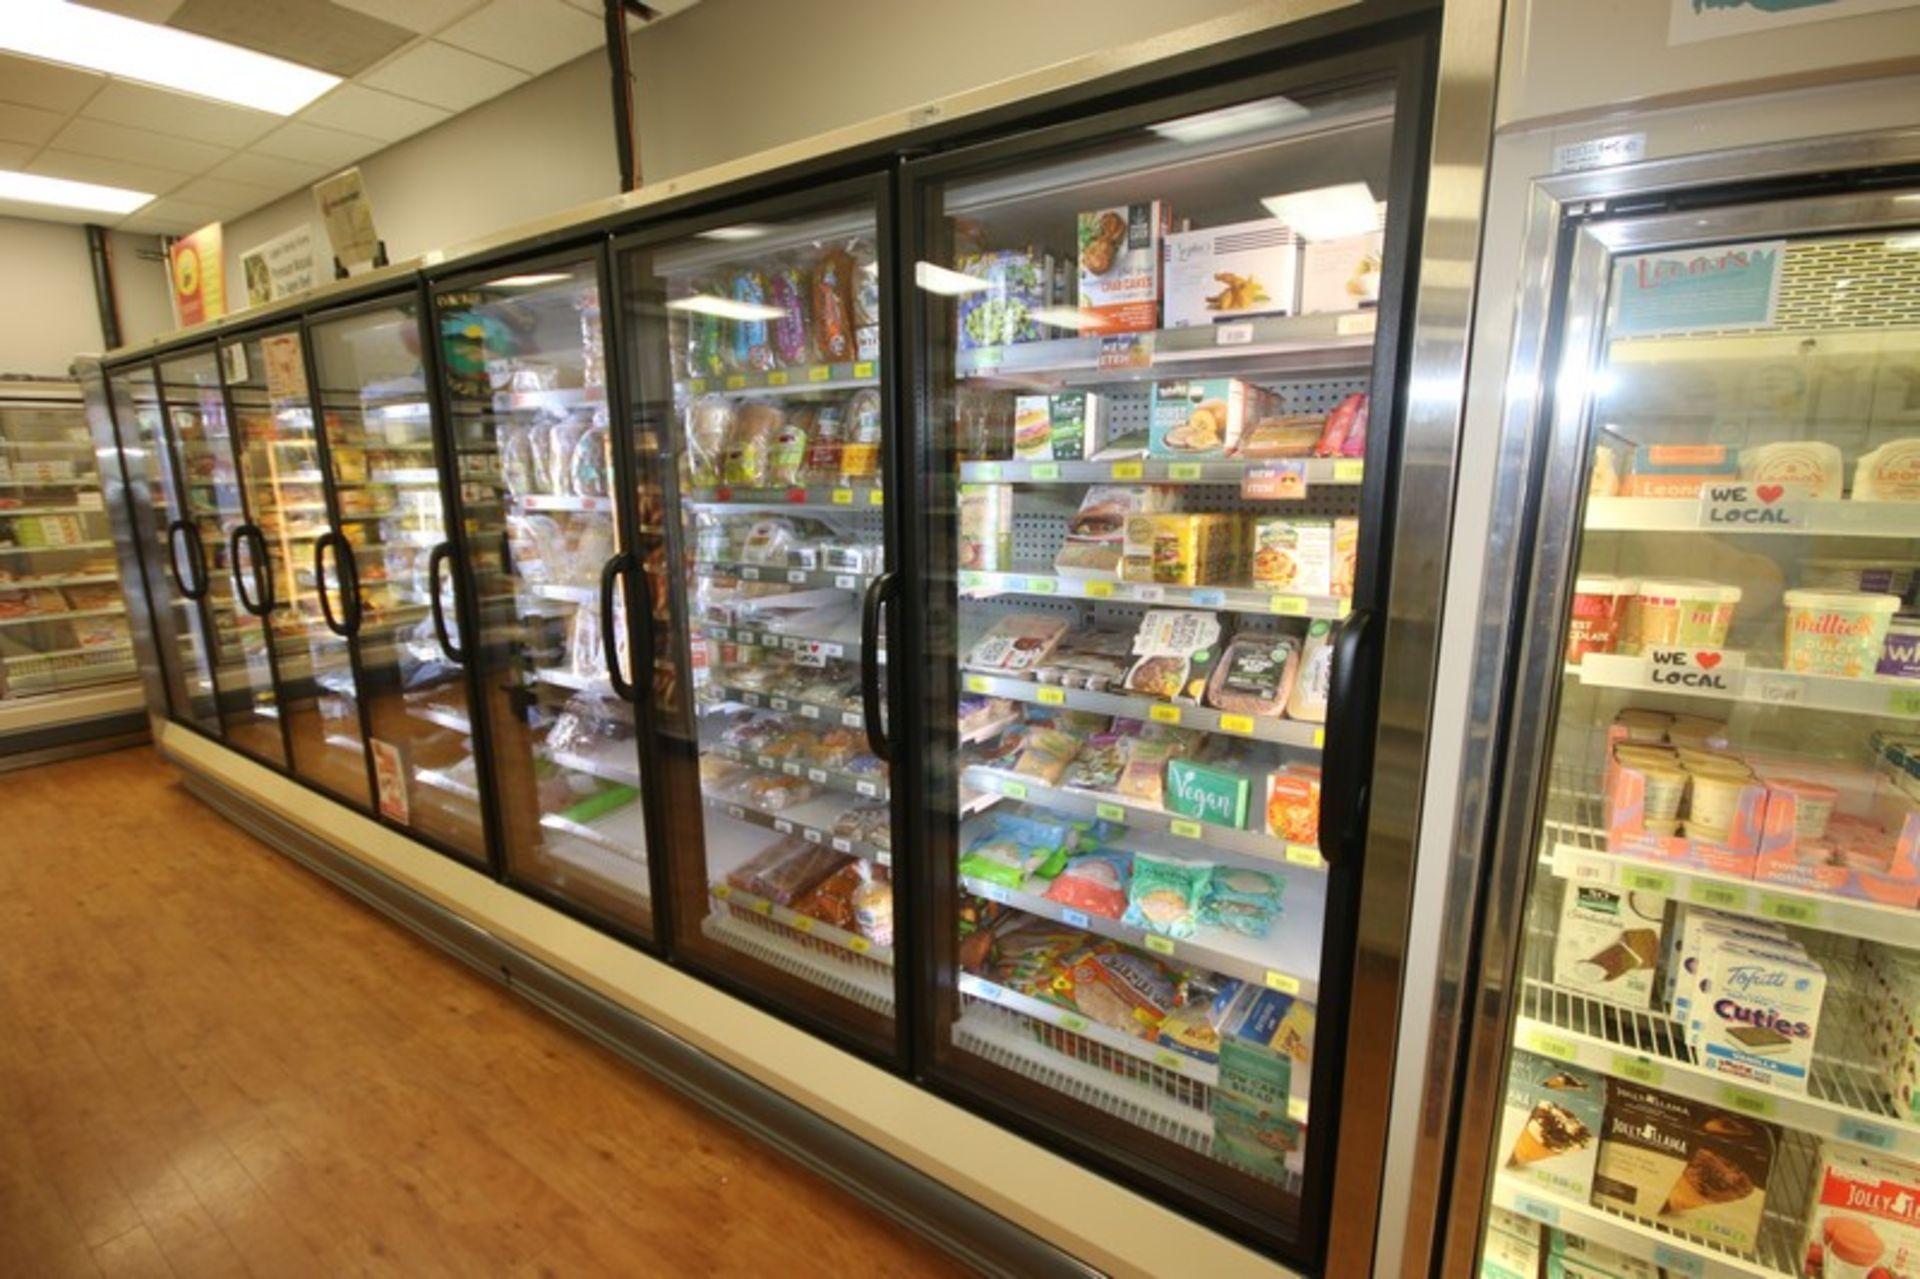 Hussman 3-Door Refrigeration Unit, M/N RLN-3, S/N MY10L391309, 120/208 Volts, R404A Refrigerant, - Image 3 of 3